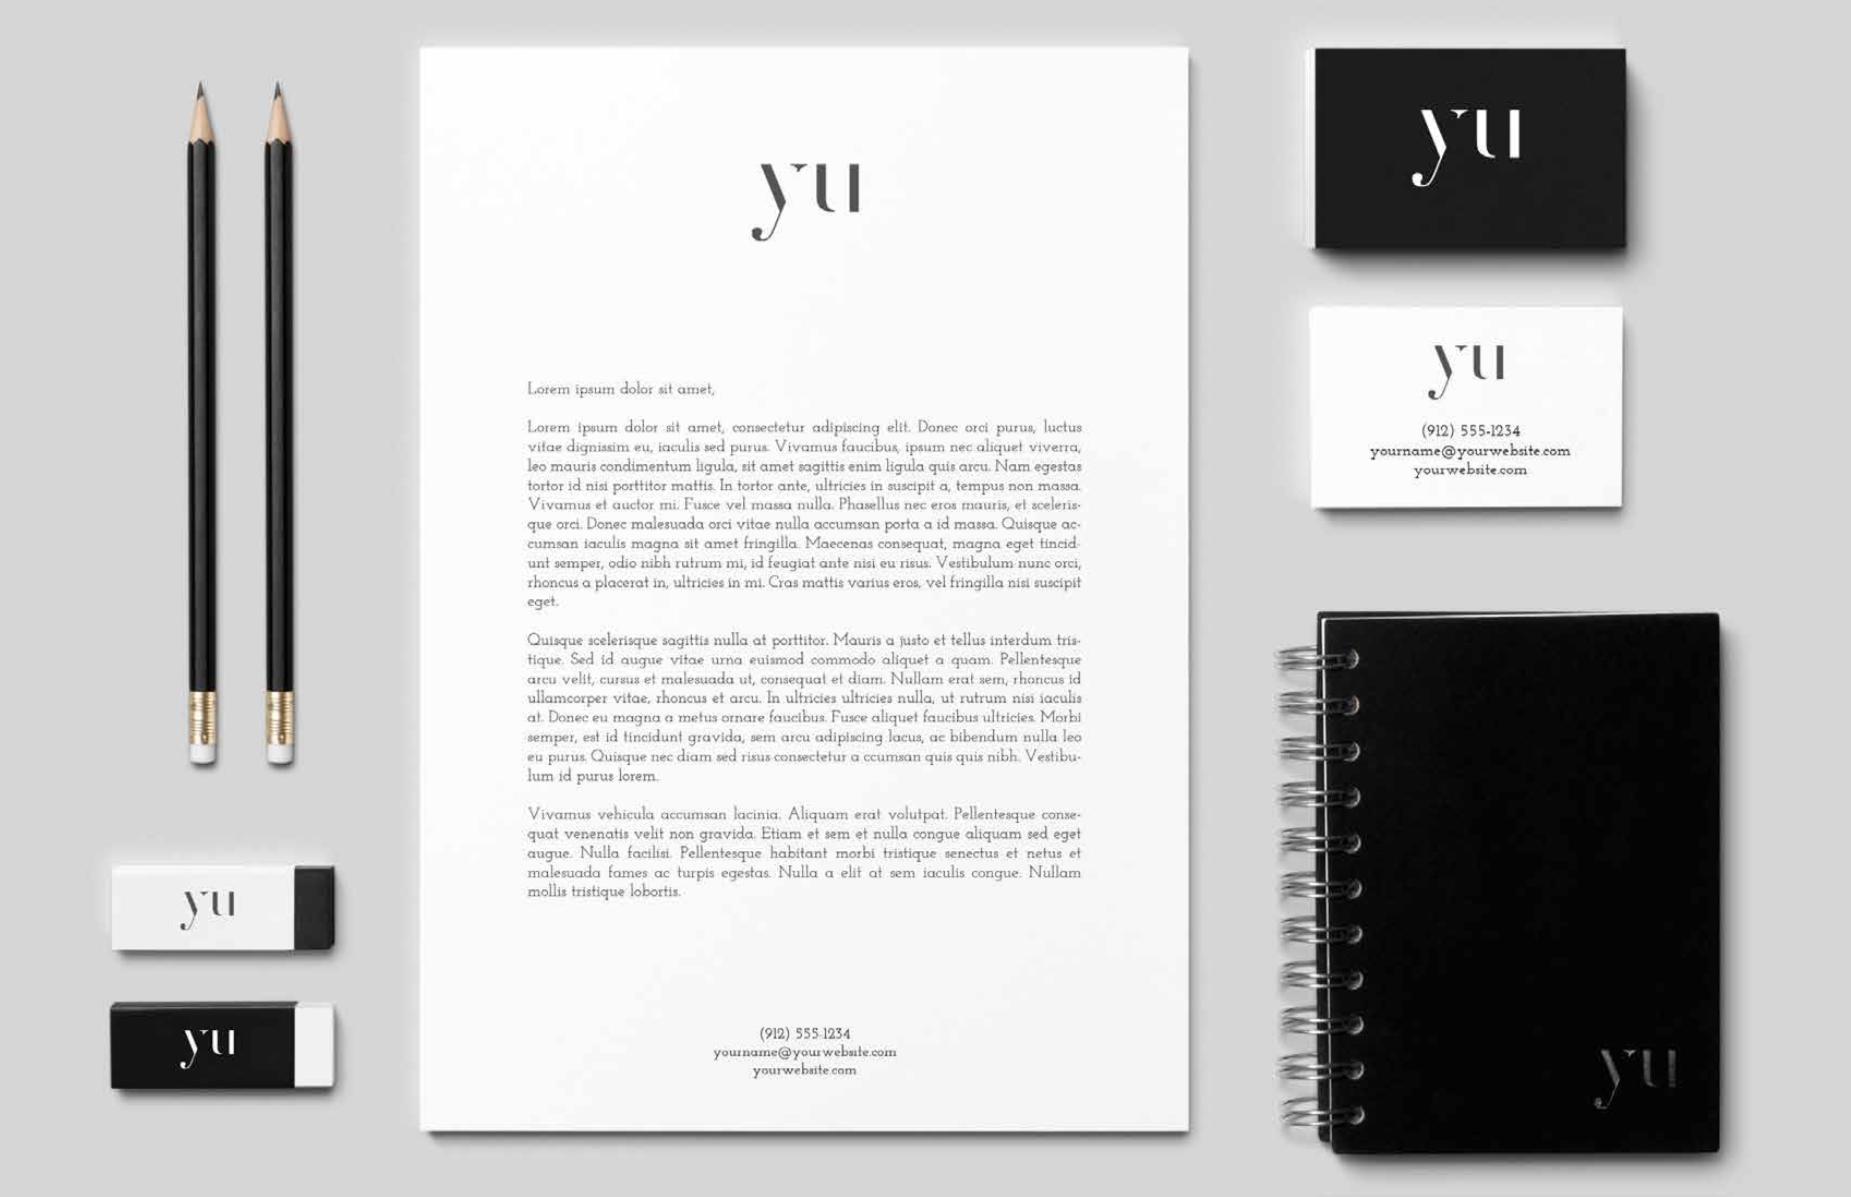 YU-bed-sleep-number-ben-rummel-design-4.png